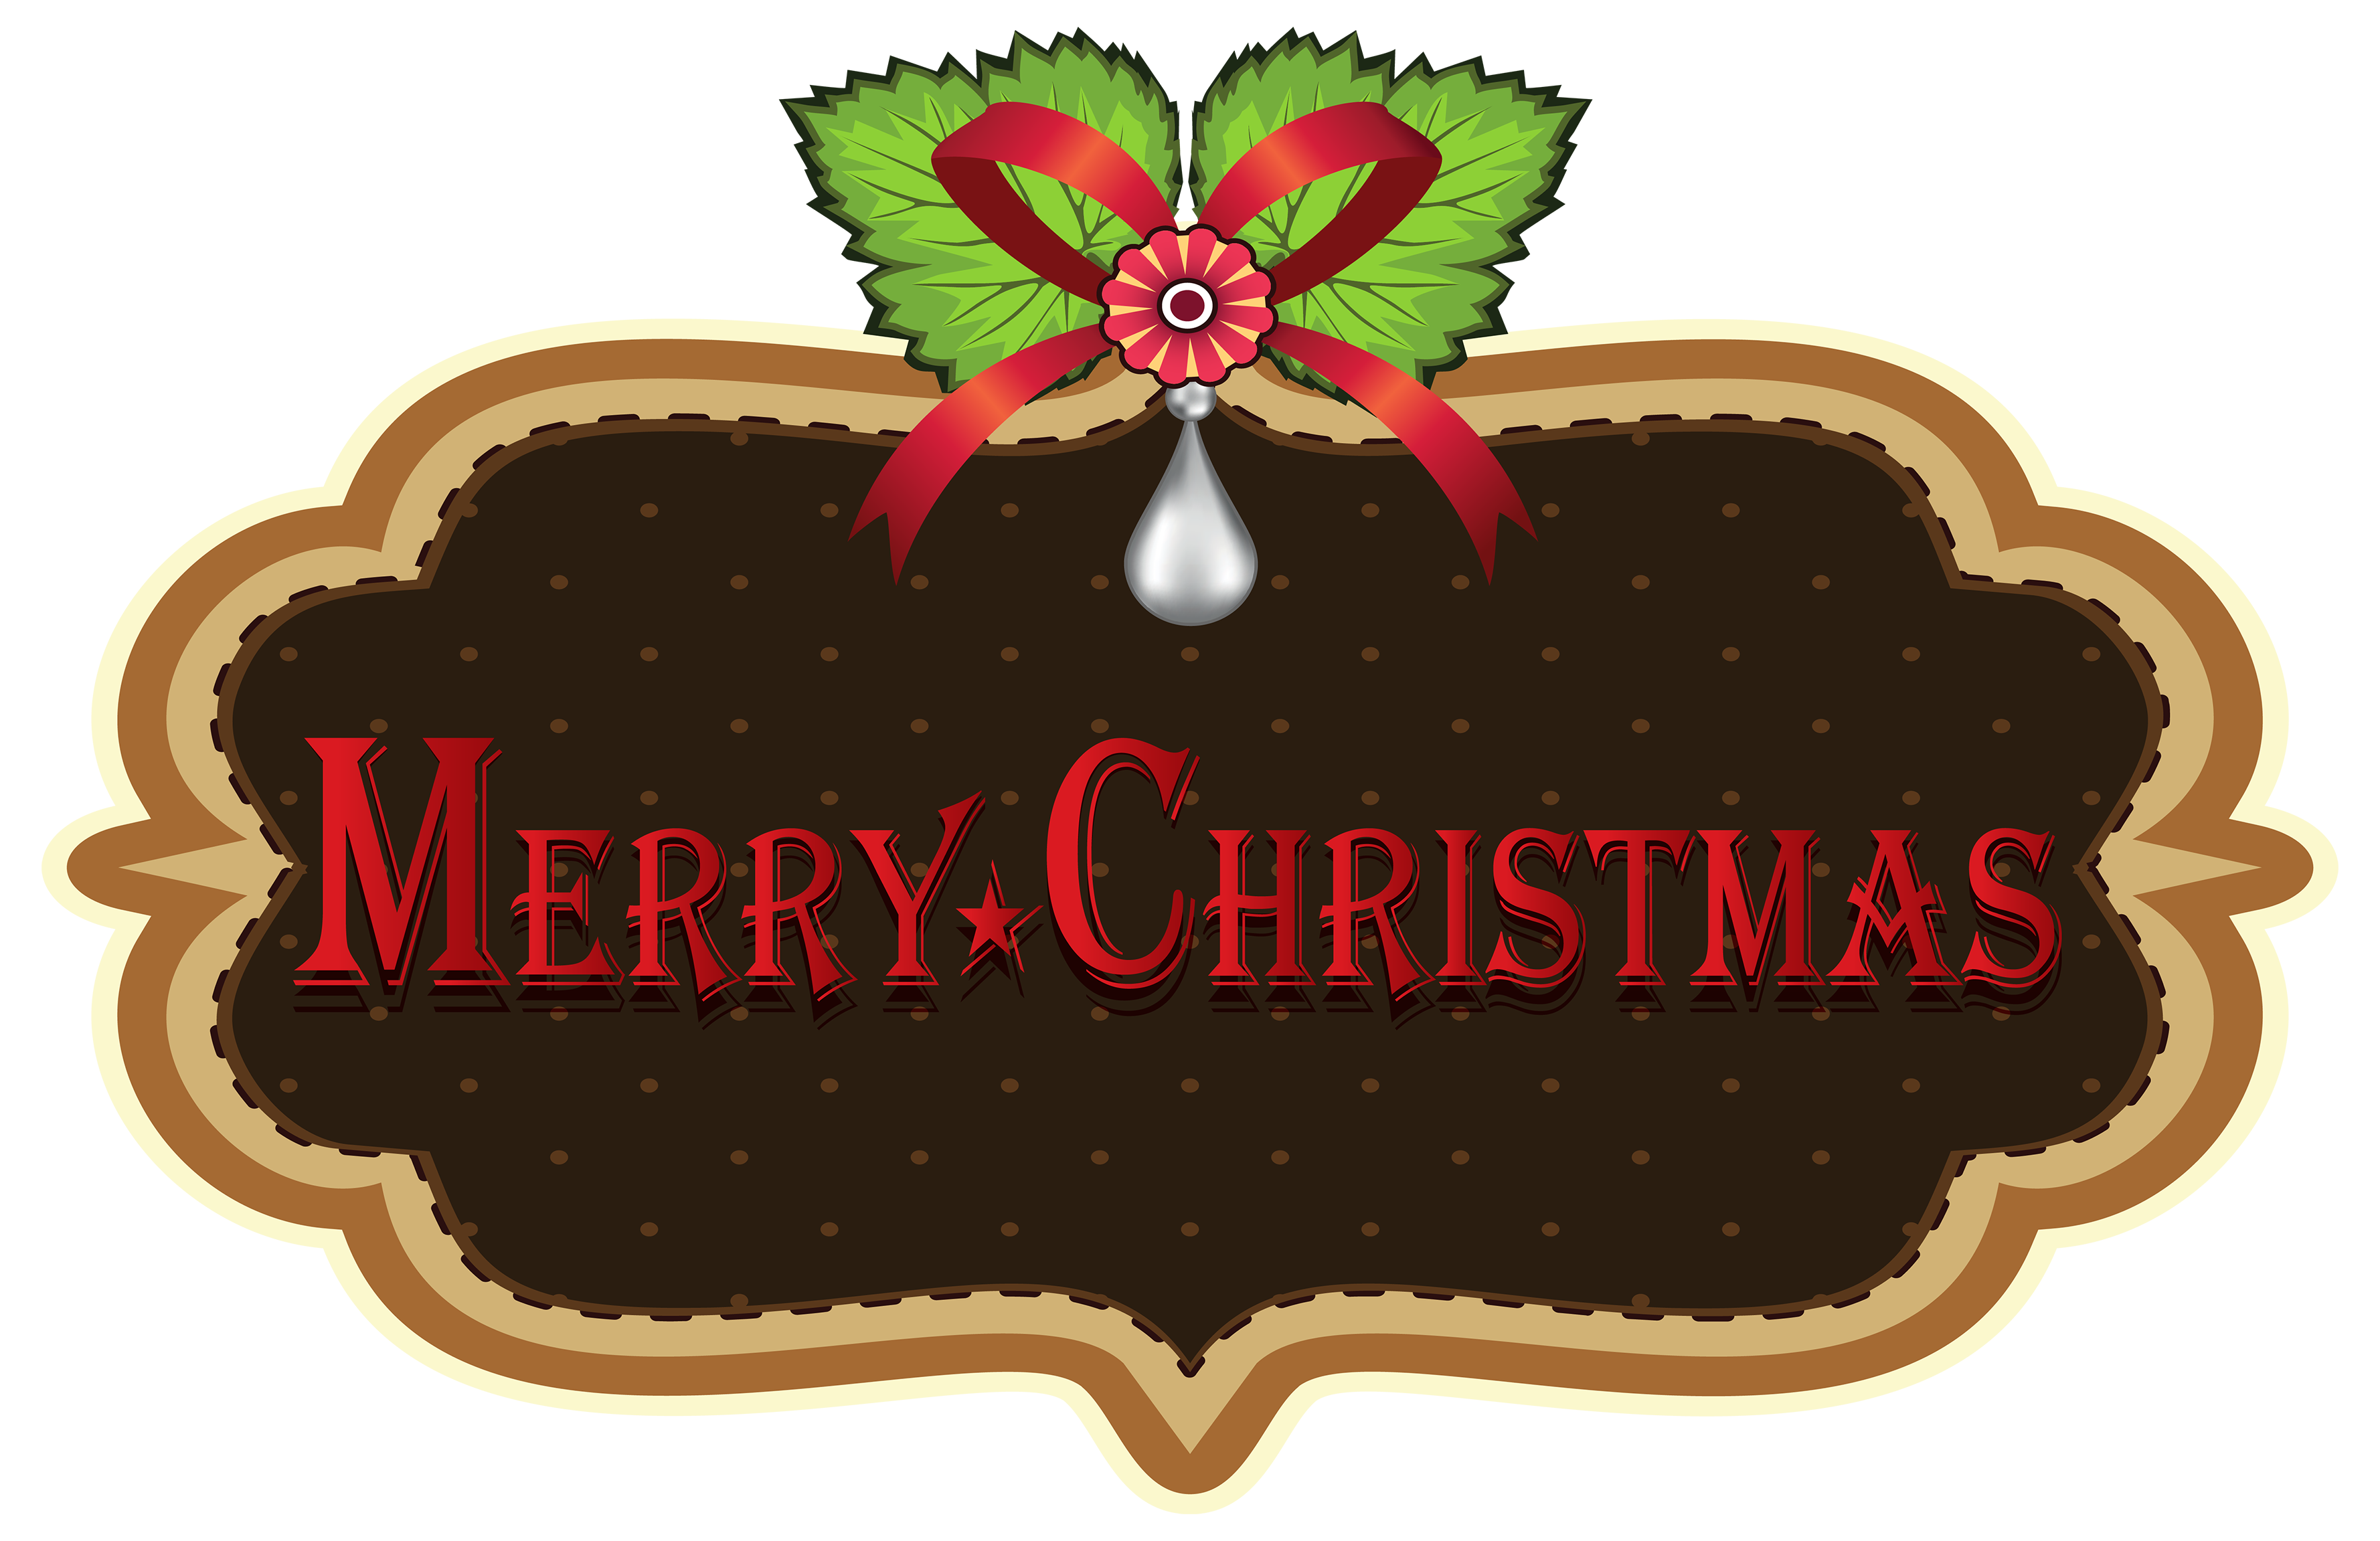 Christmas sayings clipart graphic royalty free stock Pin by Antonia Mendez on ETIQUETAS DE NAVIDAD   Pinterest graphic royalty free stock